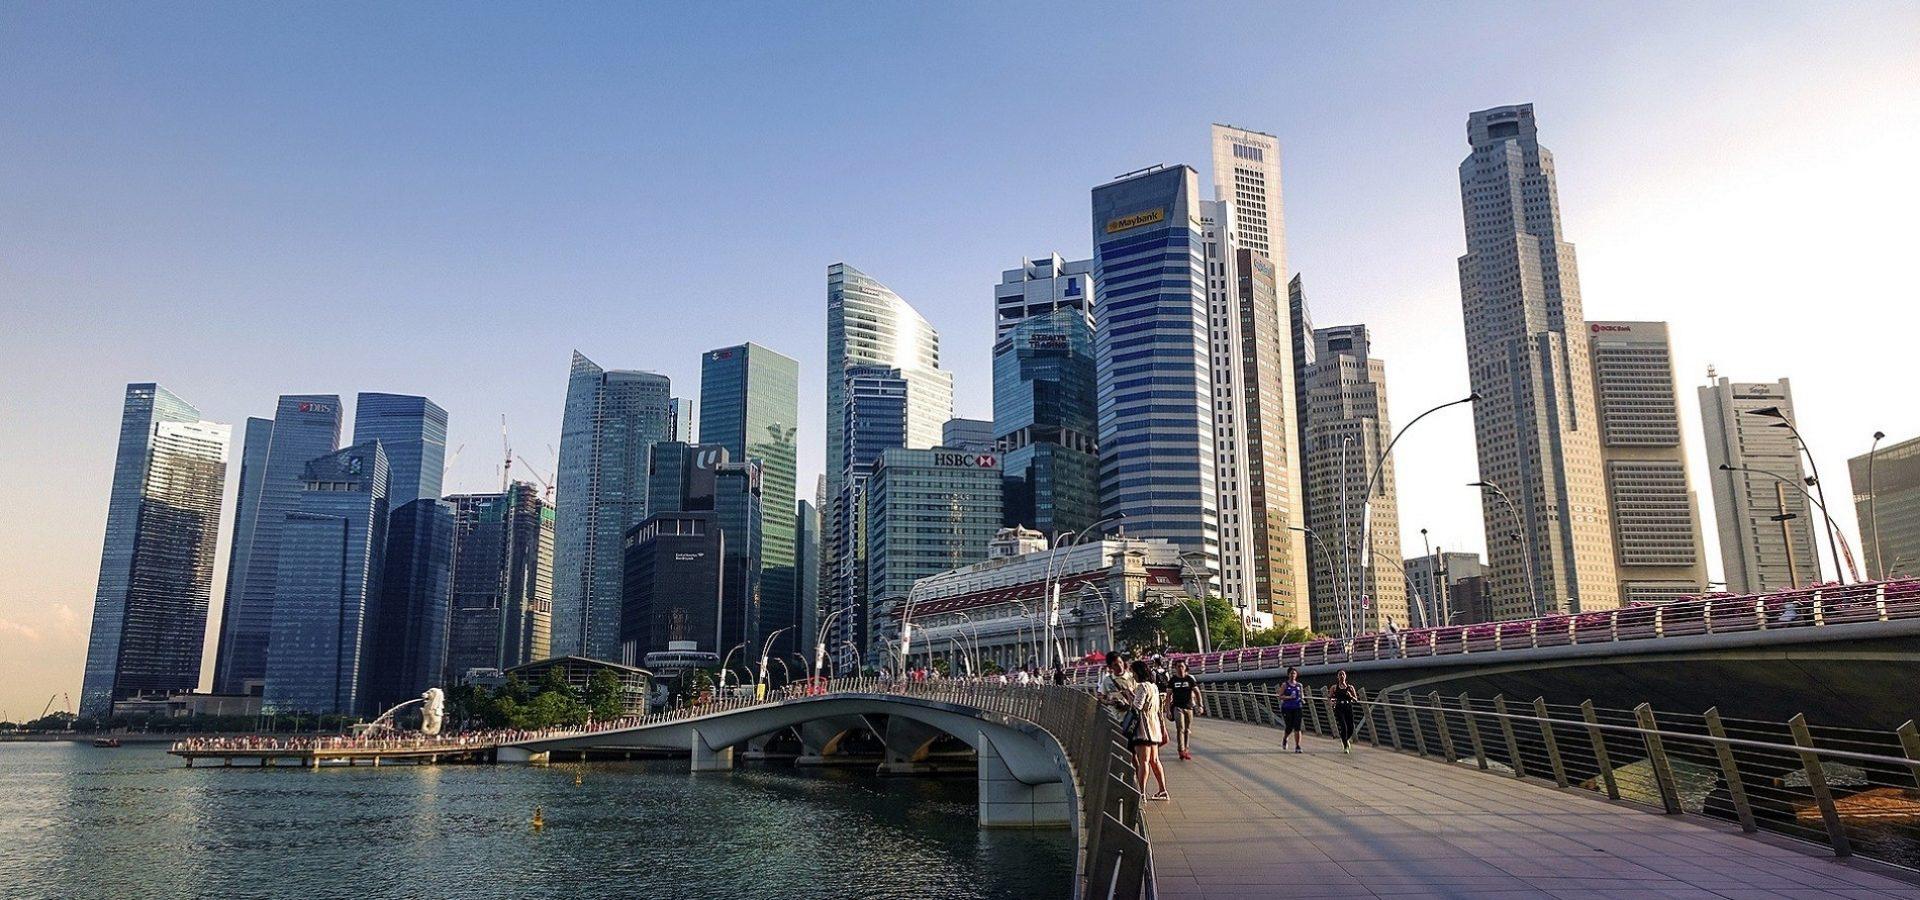 Tečaj engleskog jezika - EF Education First Singapur